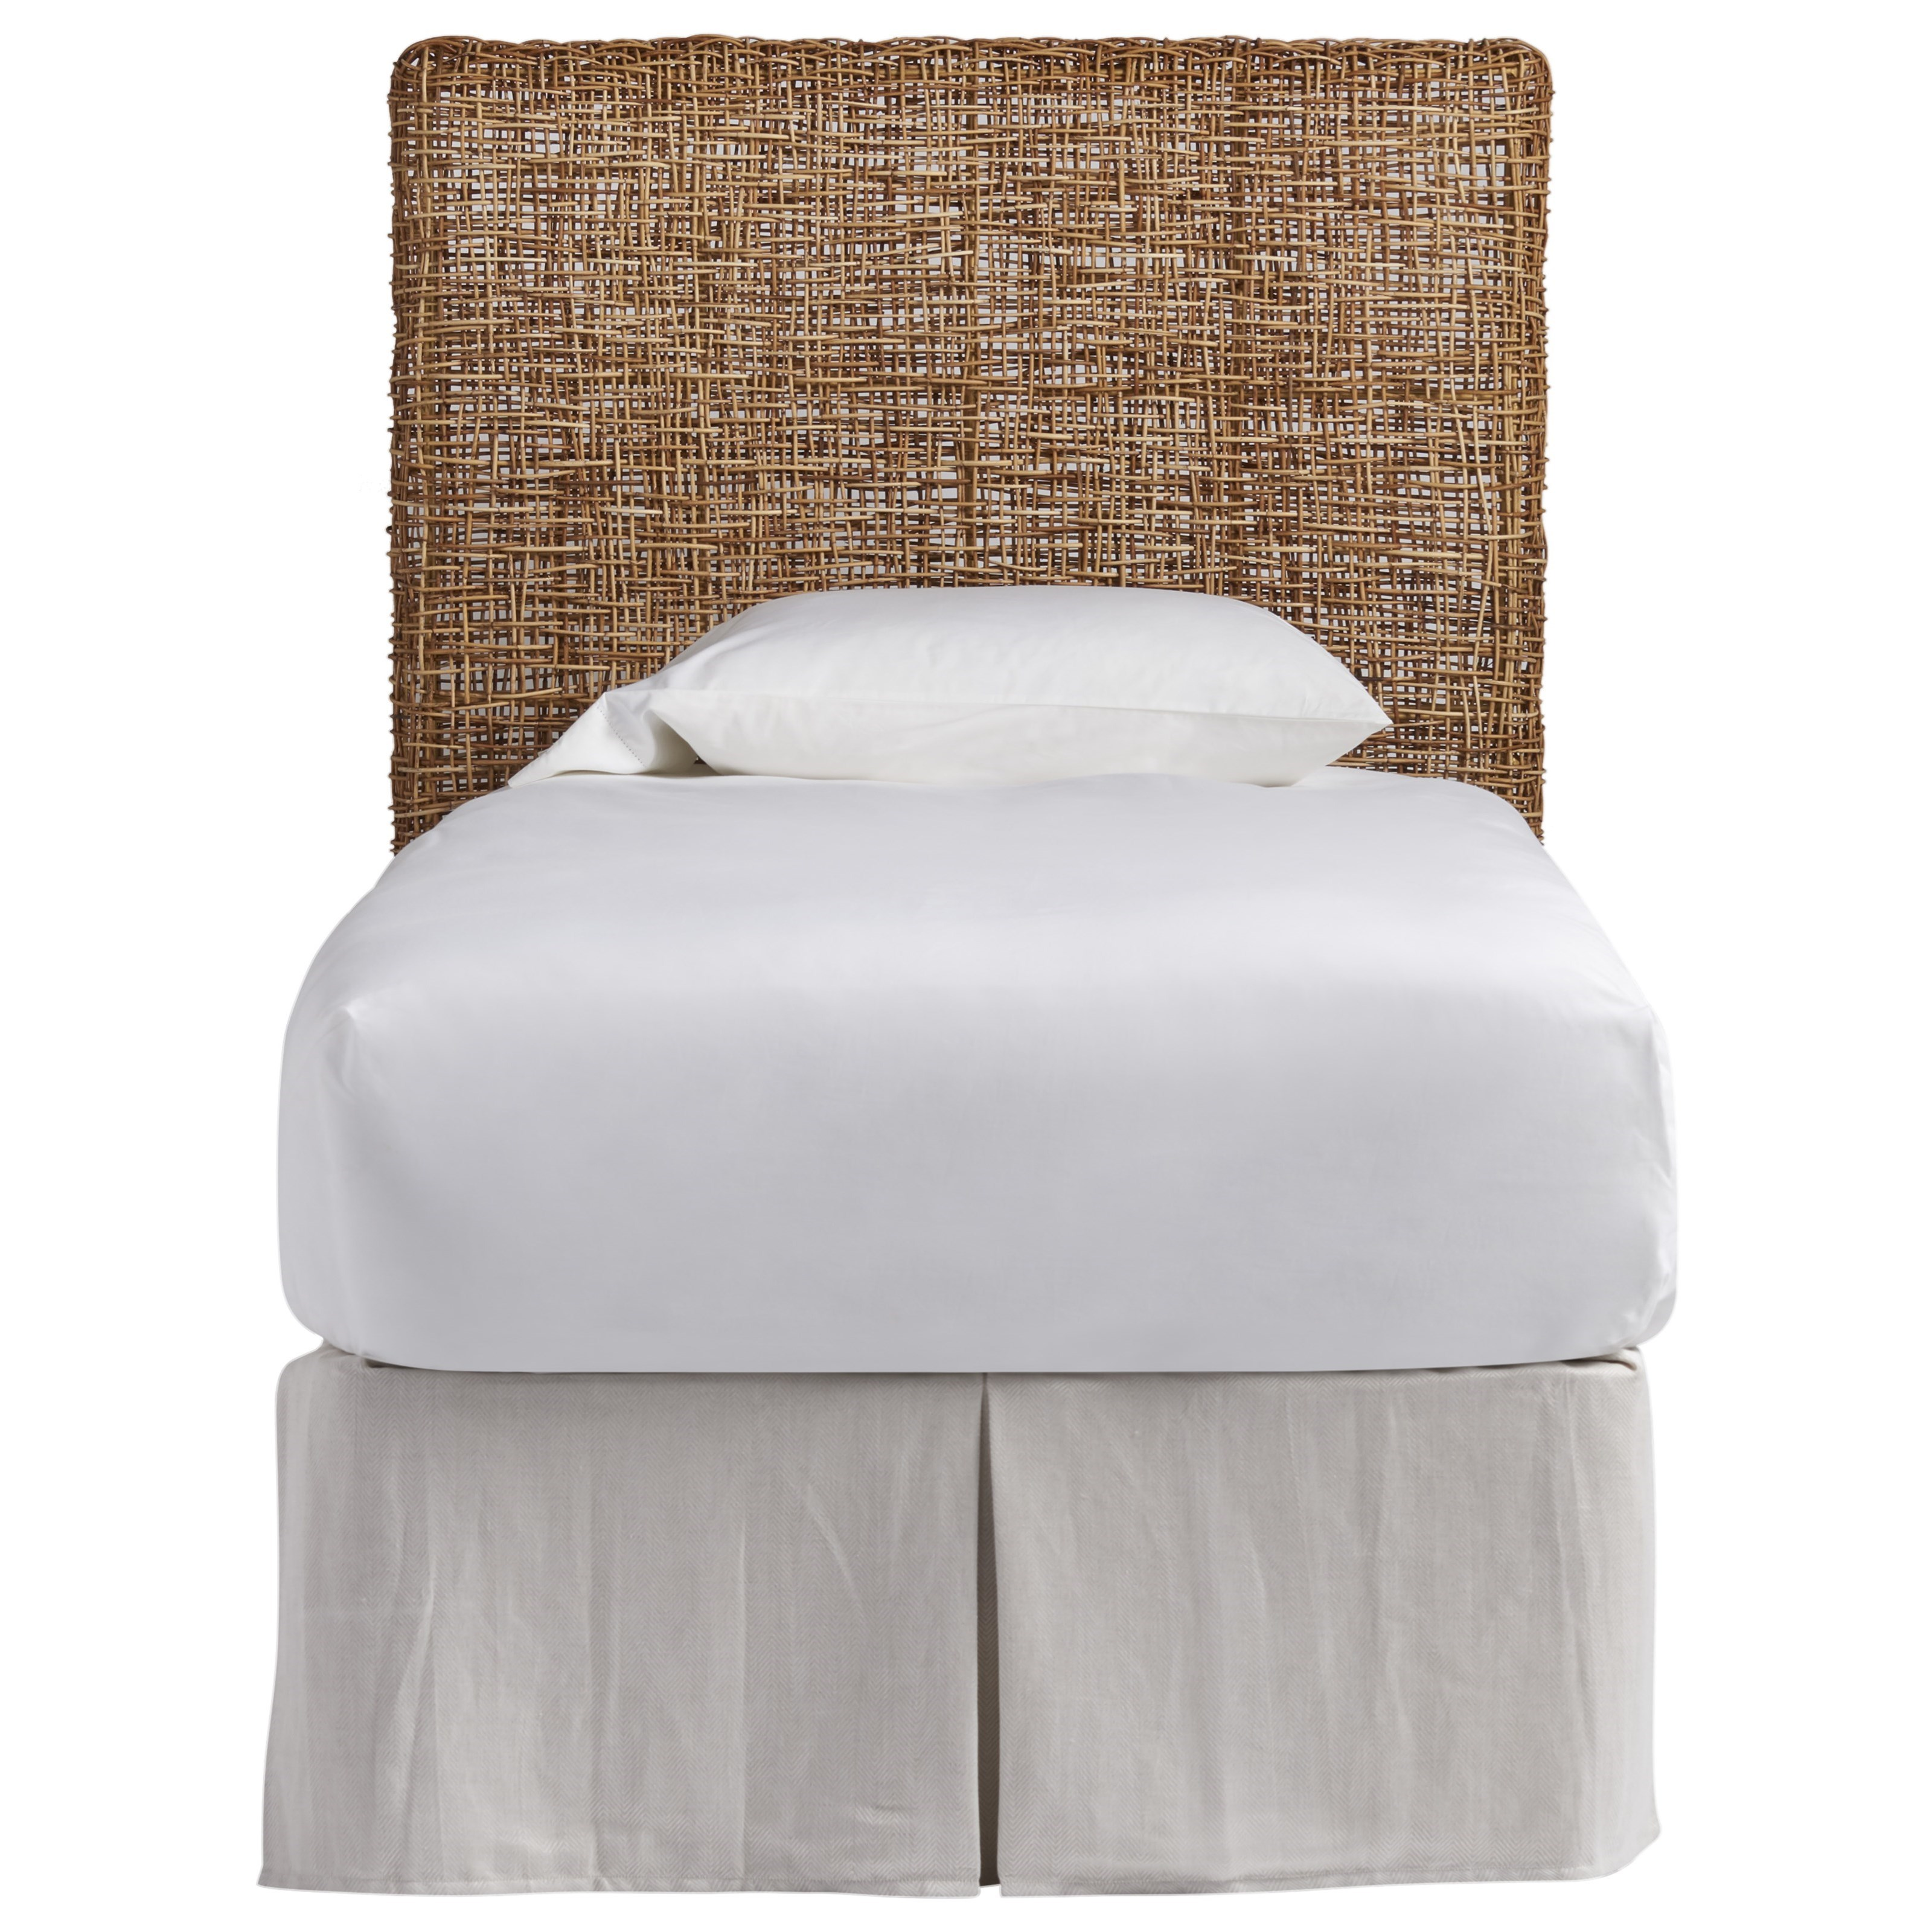 Coastal Living Home - Escape Twin Headboard by Universal at HomeWorld Furniture